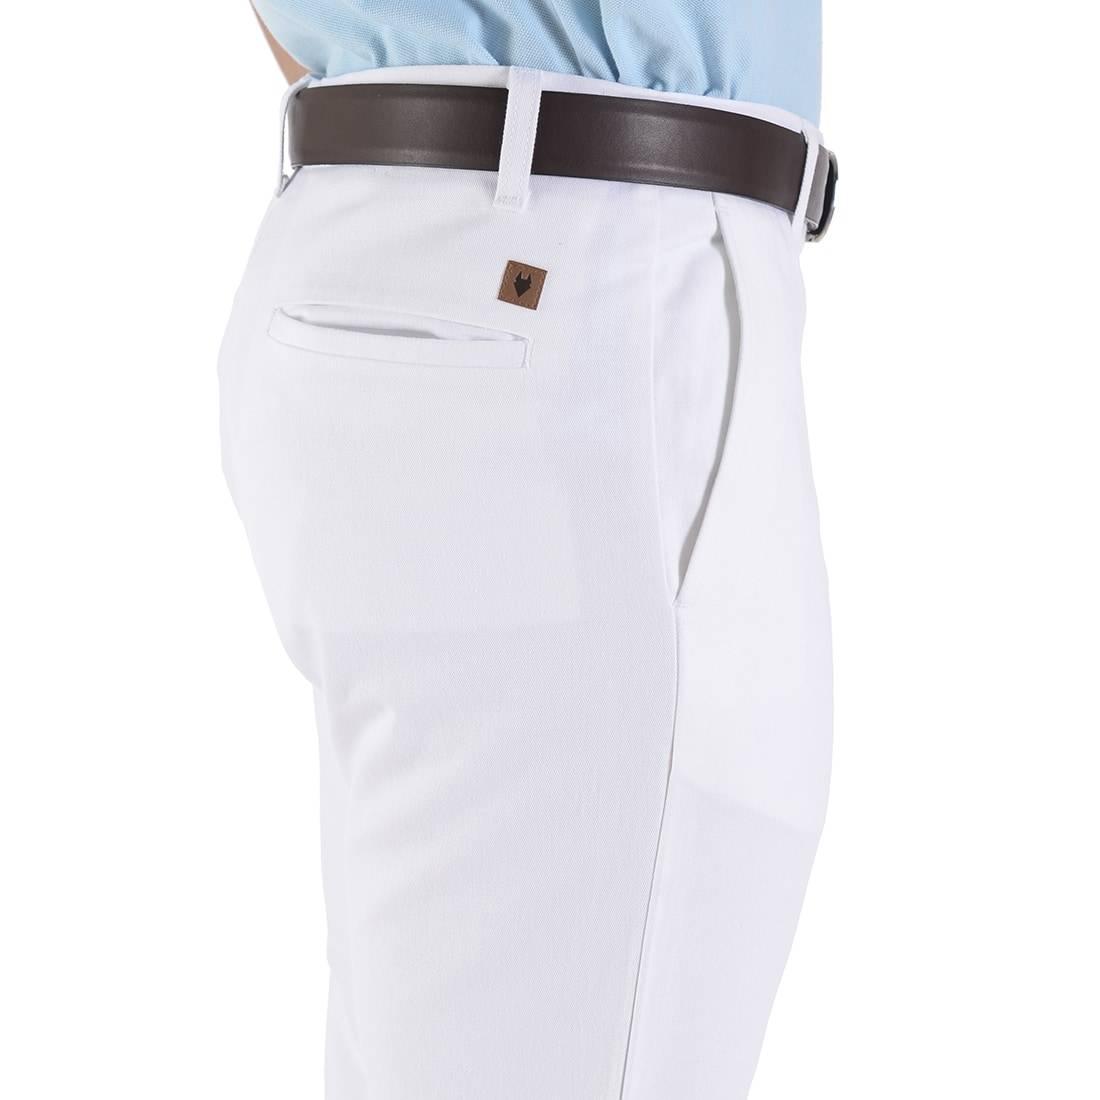 010789055202-04-Pantalon-Casual-Classic-Fit-Blanco-yale